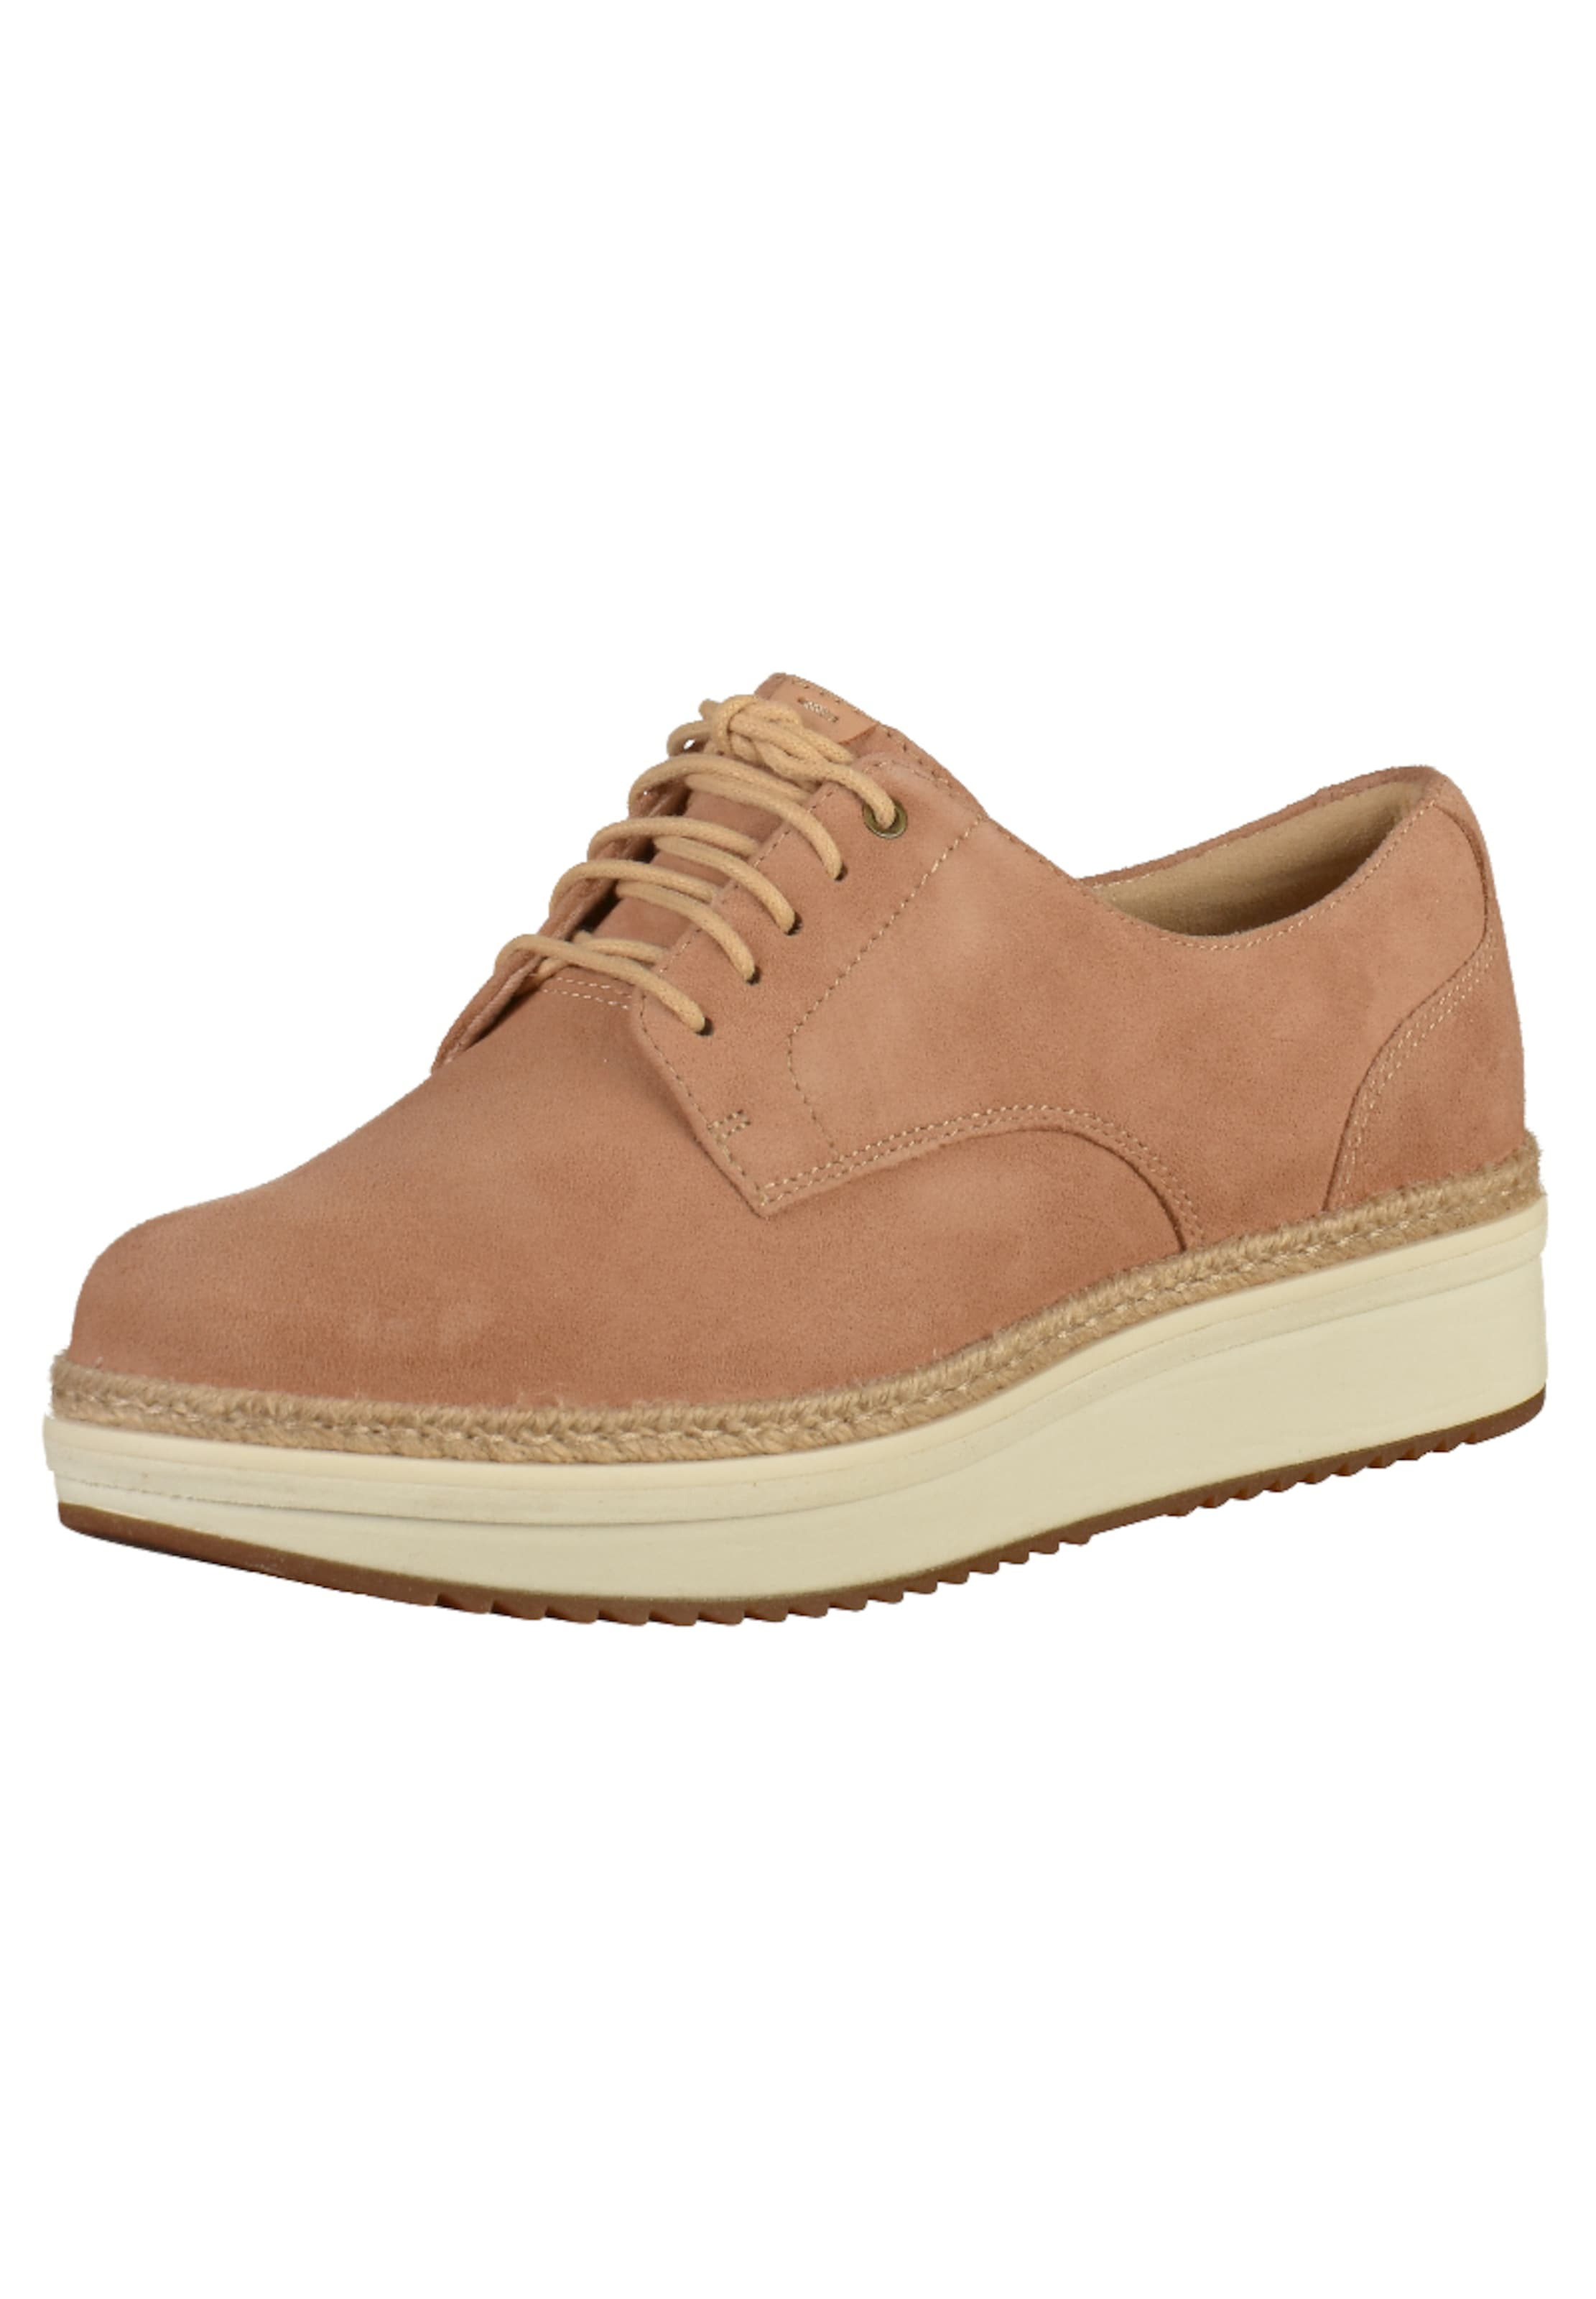 Haltbare Mode billige Schuhe CLARKS | Halbschuhe Schuhe Gut getragene Schuhe